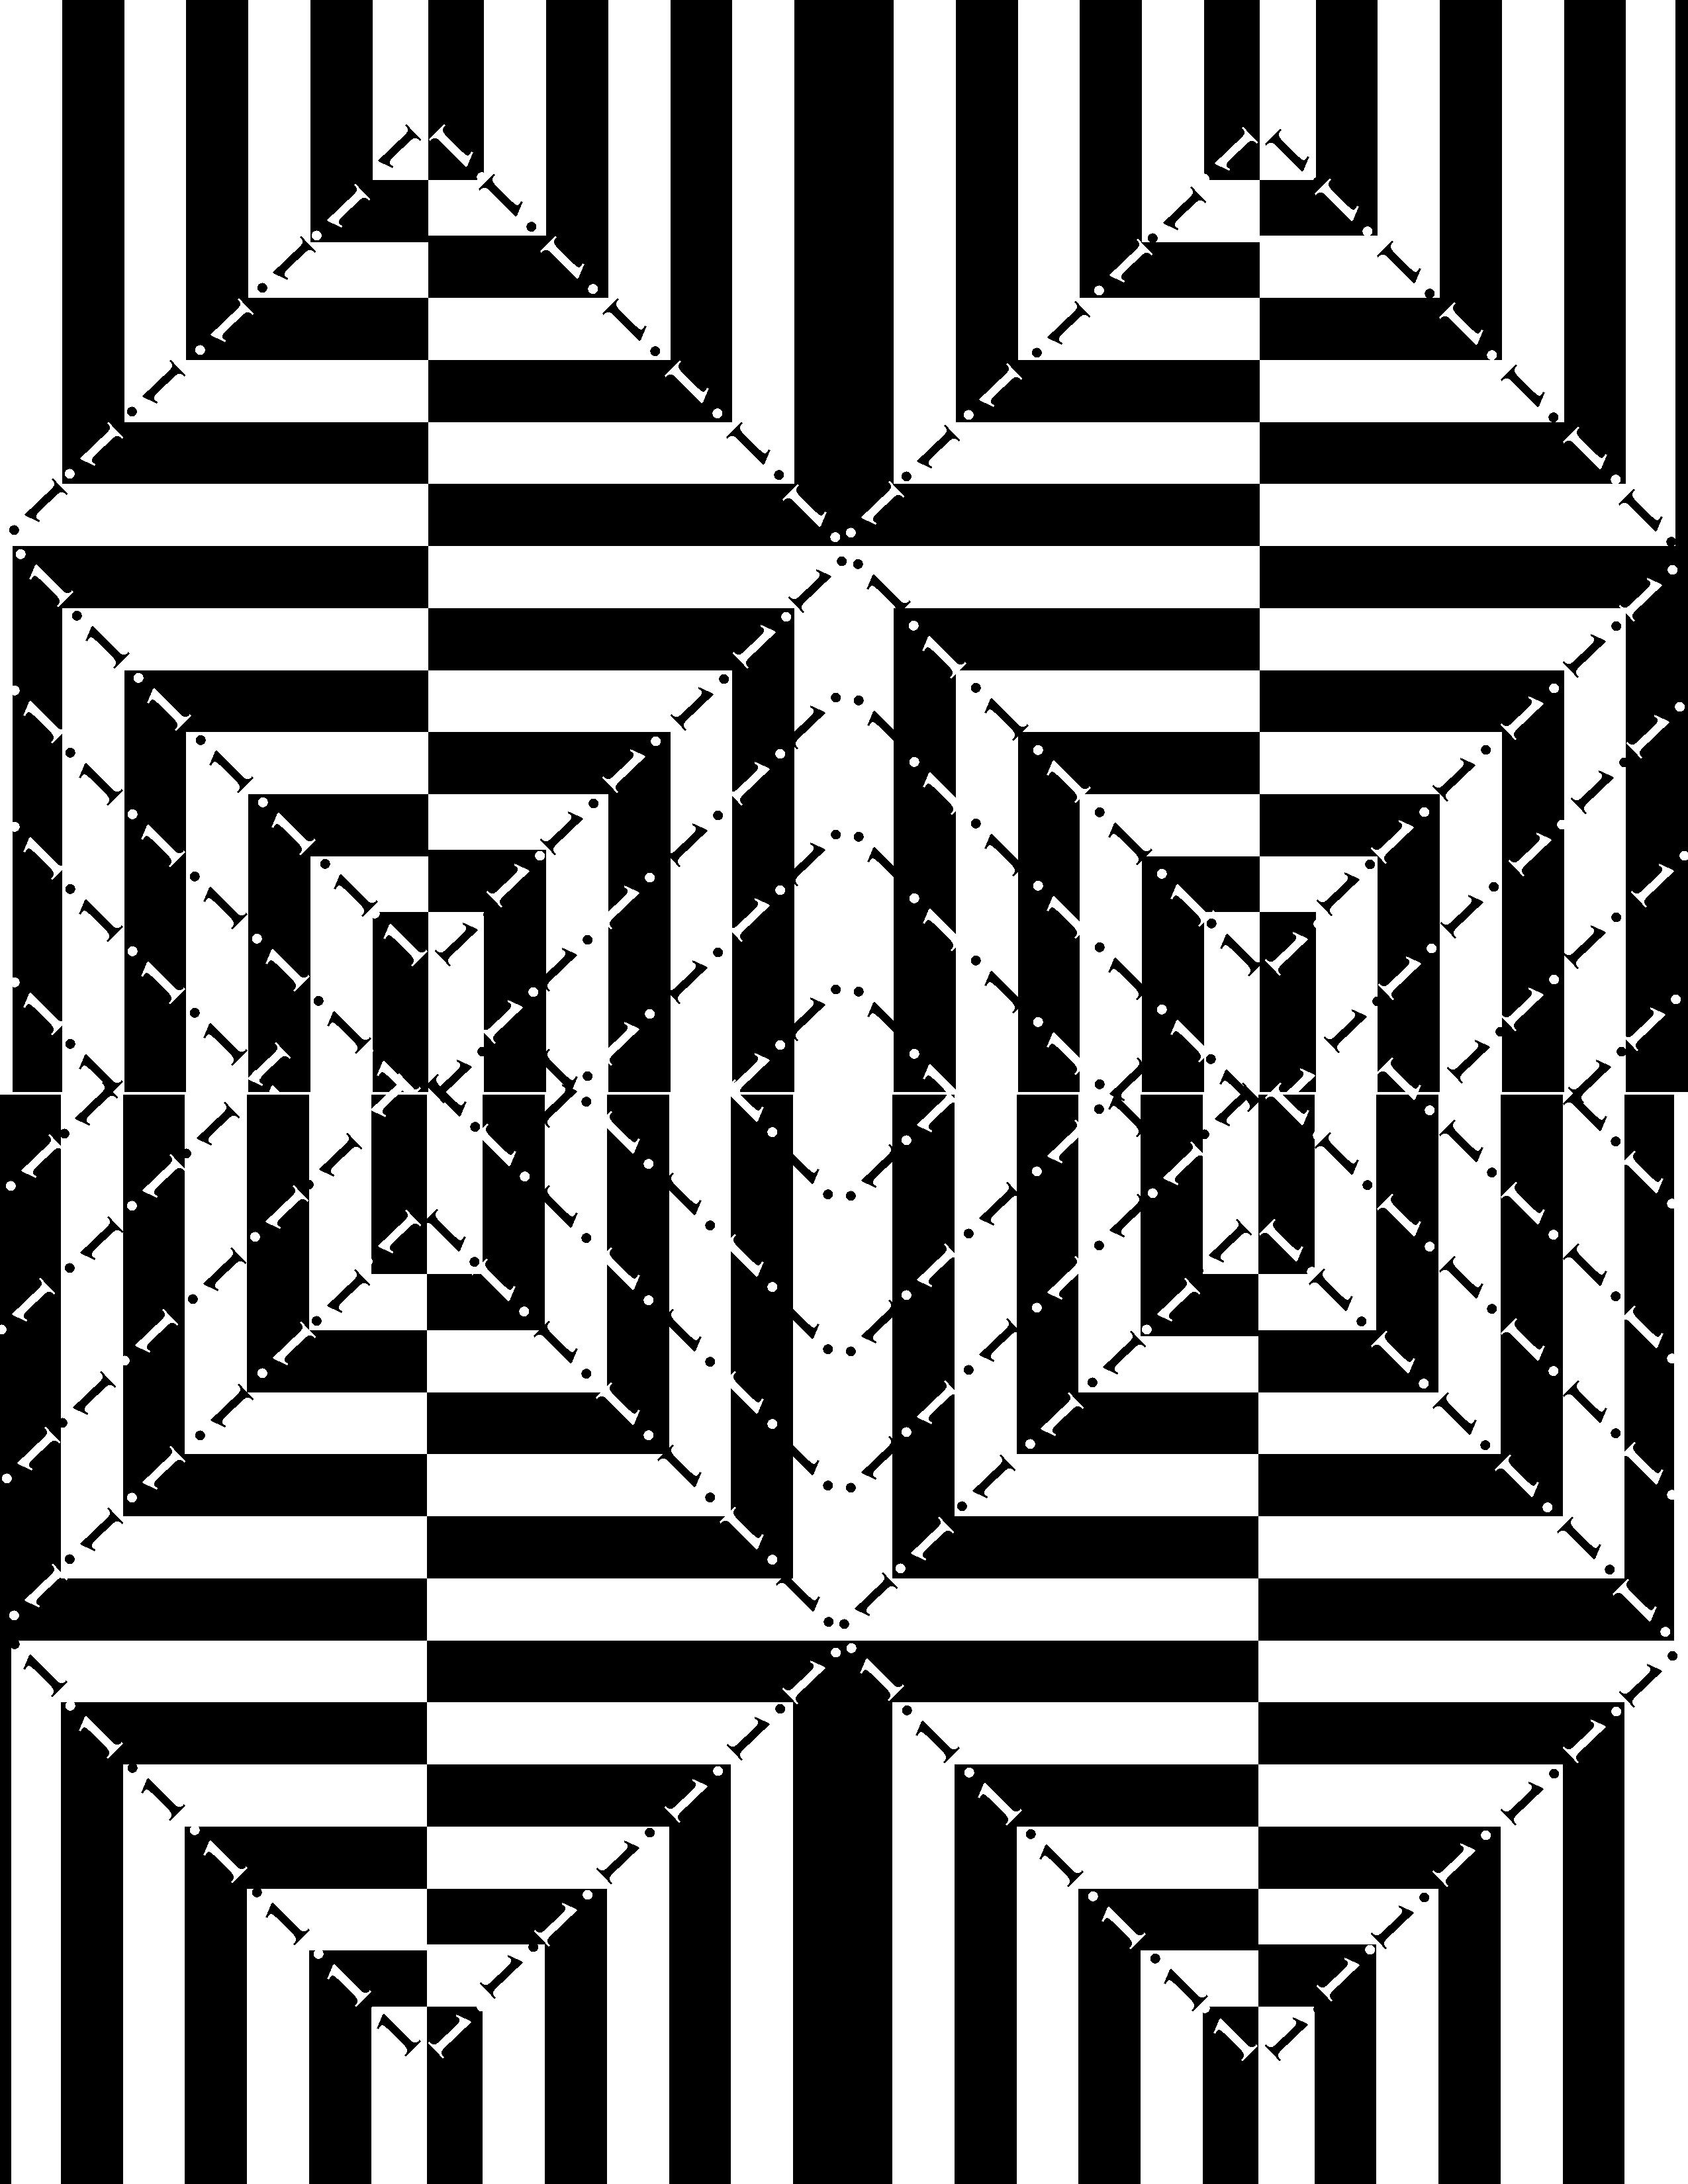 vsk project andrew topel black on white on black verysmallkitchen. Black Bedroom Furniture Sets. Home Design Ideas